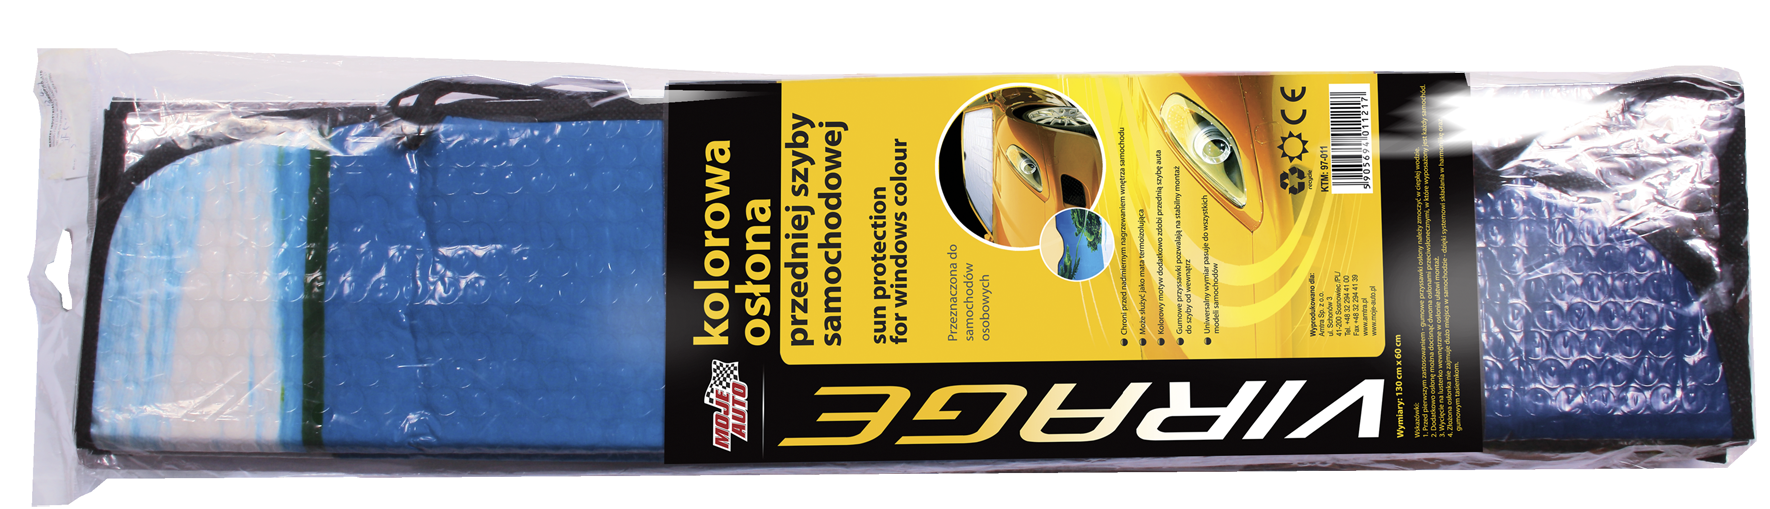 Windscreen cover VIRAGE 97-011 5905694011217